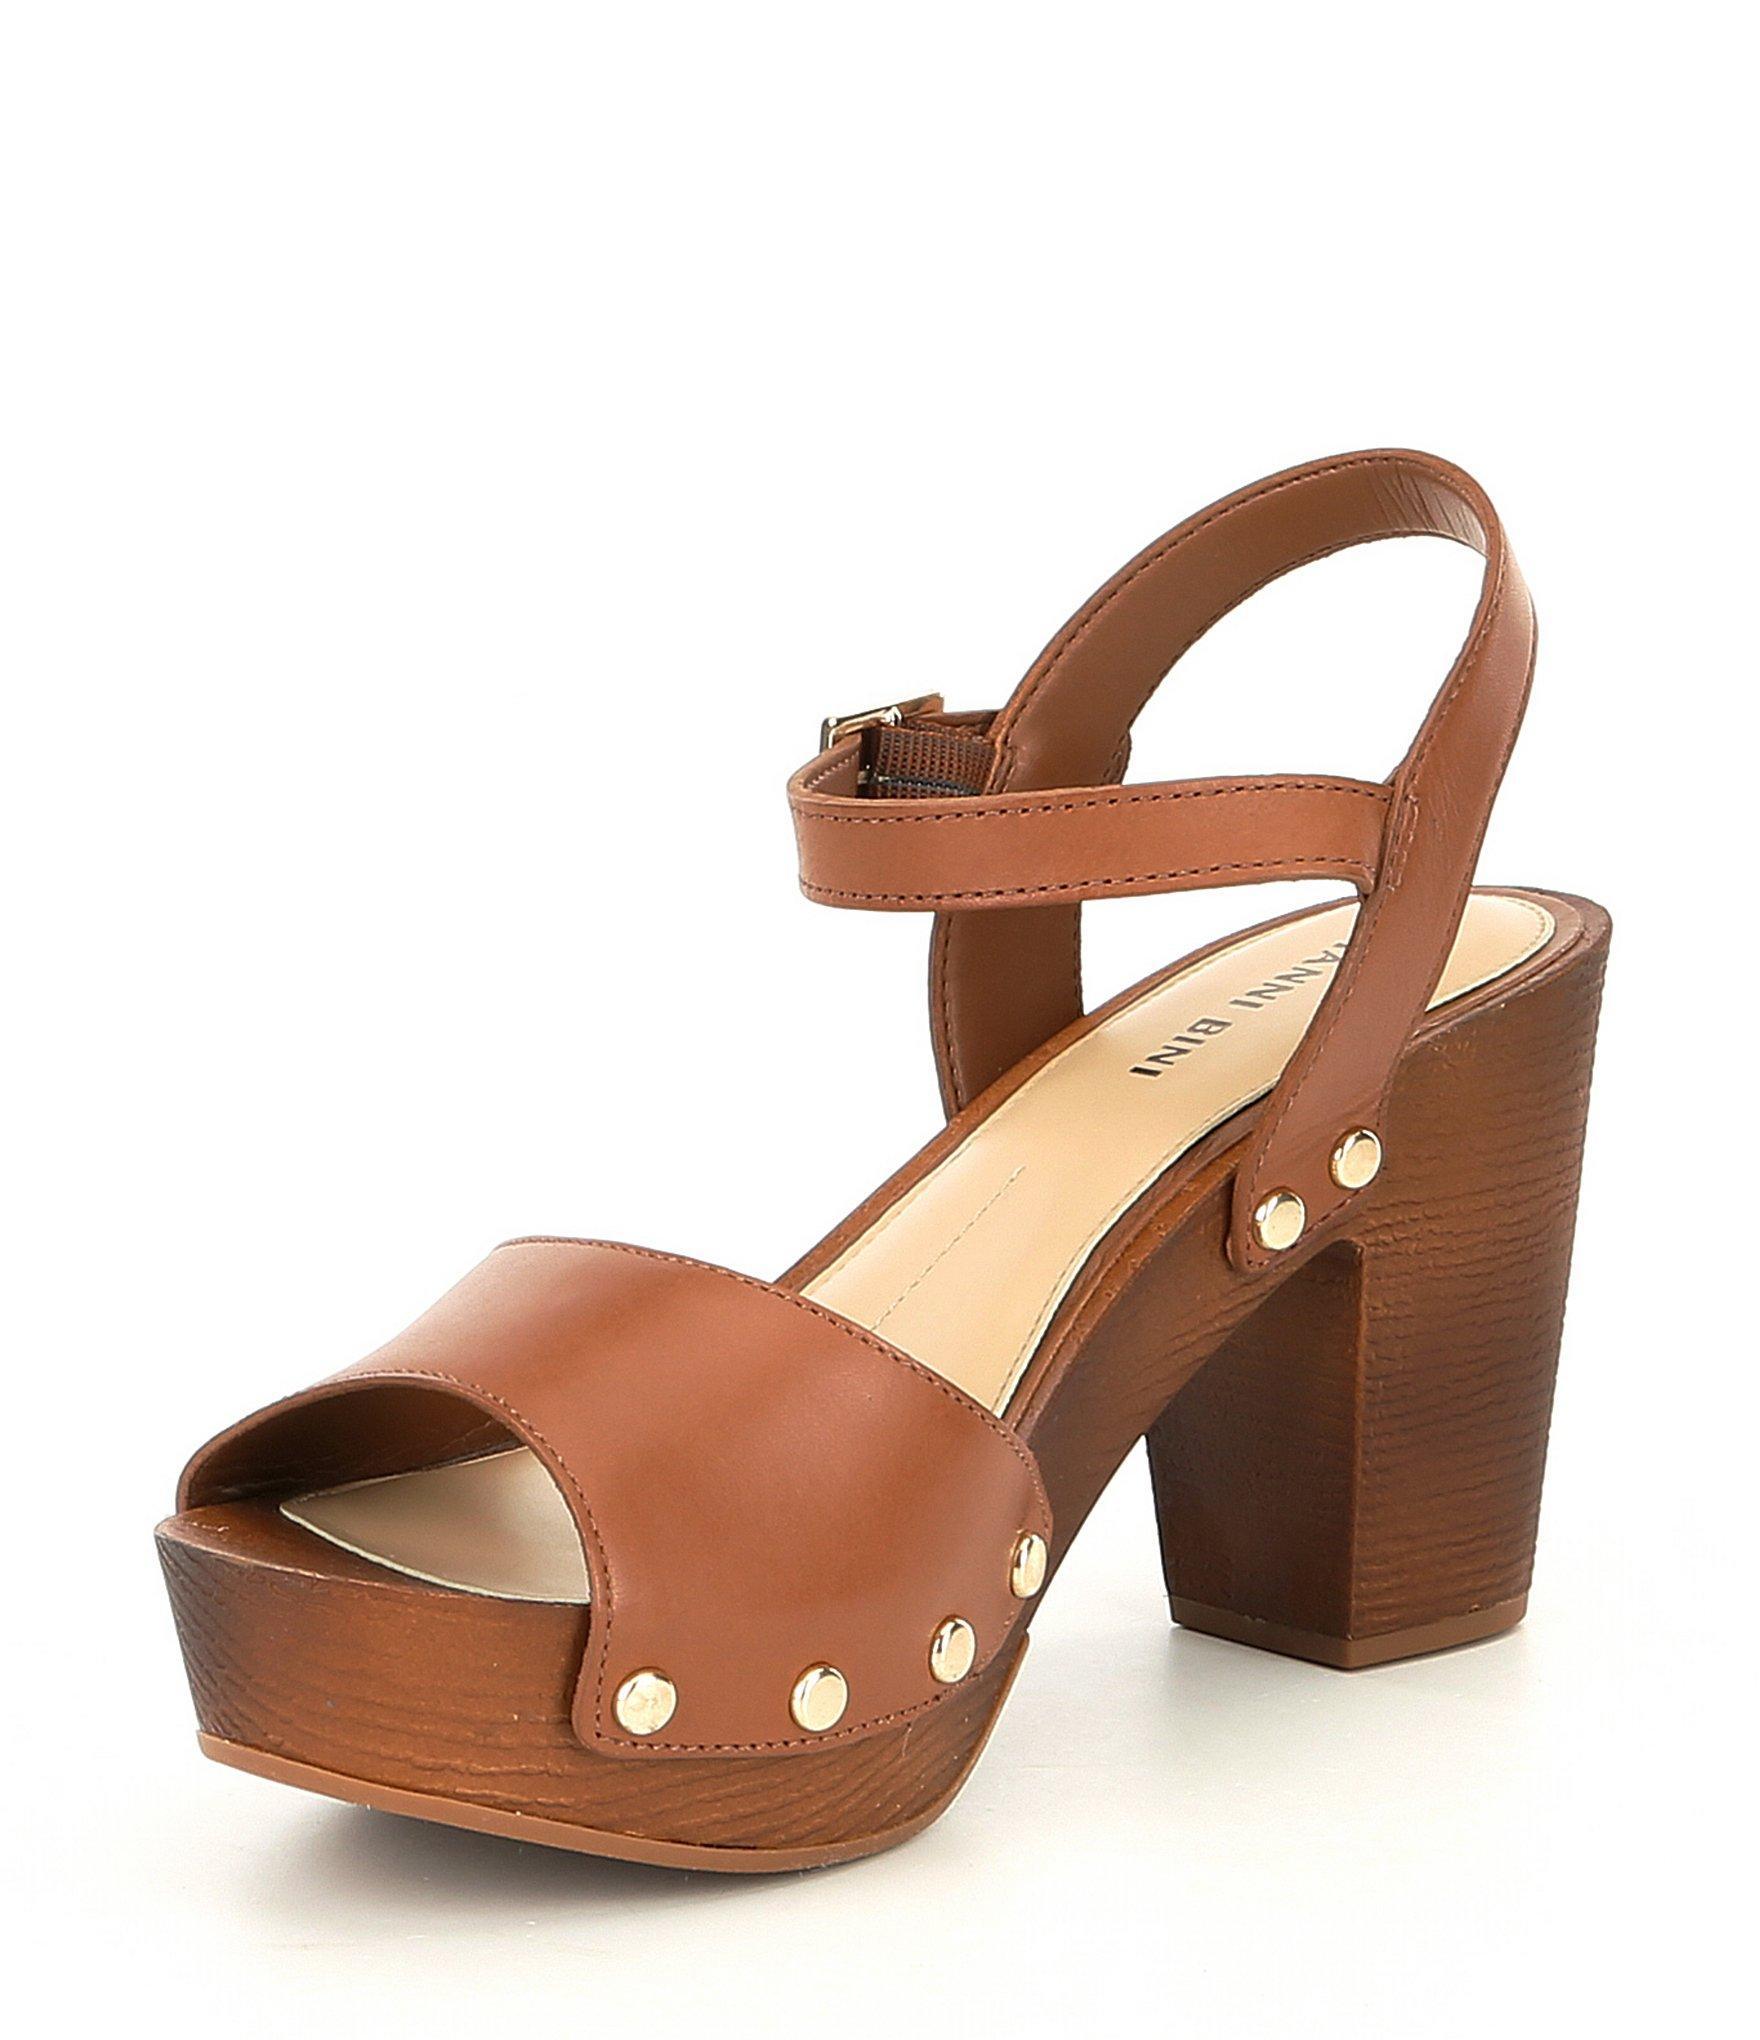 34dd78a8dee Gianni Bini - Brown Renella Two-strap Wood Platform Block Heel Sandals -  Lyst. View fullscreen